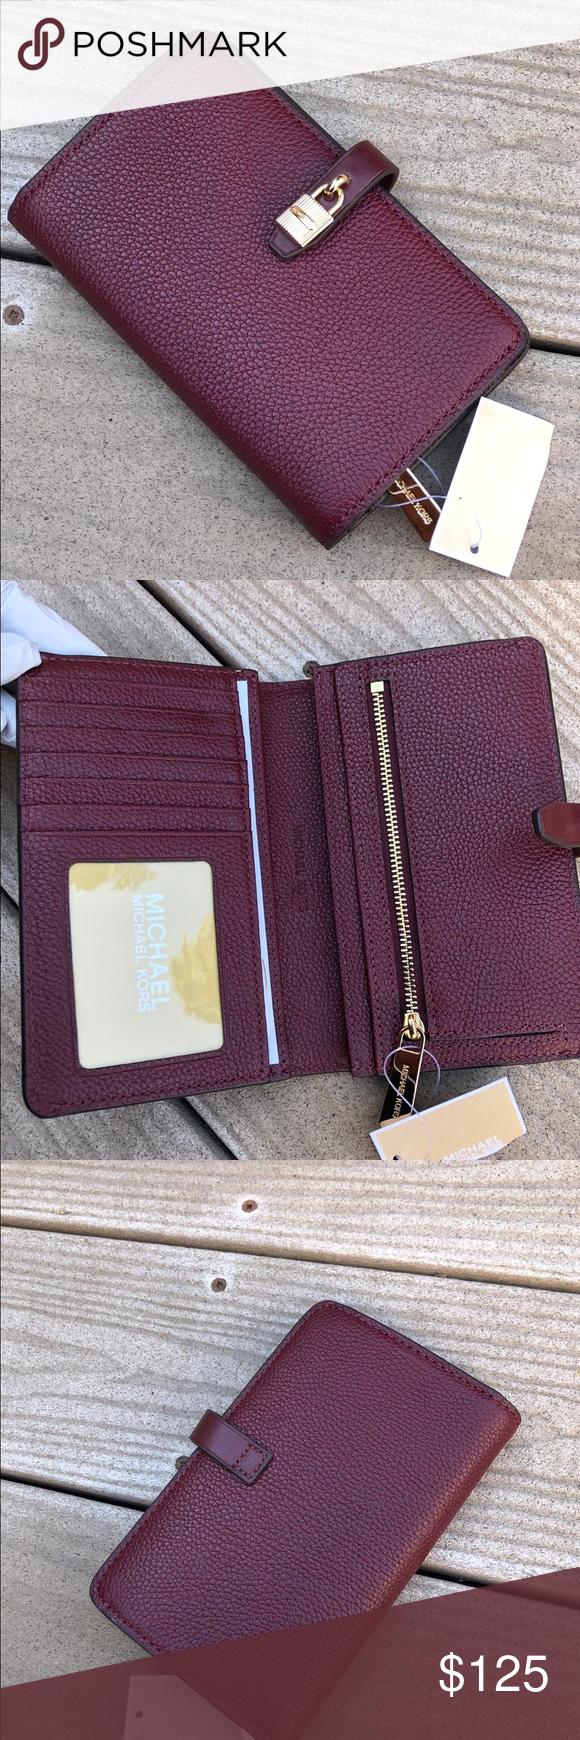 d0cdca3a3d65 Michael kors pebble adele slim bifold wallet STYLE: 35H8GAFF2L Color:  Merlot From MICHAEL Michael